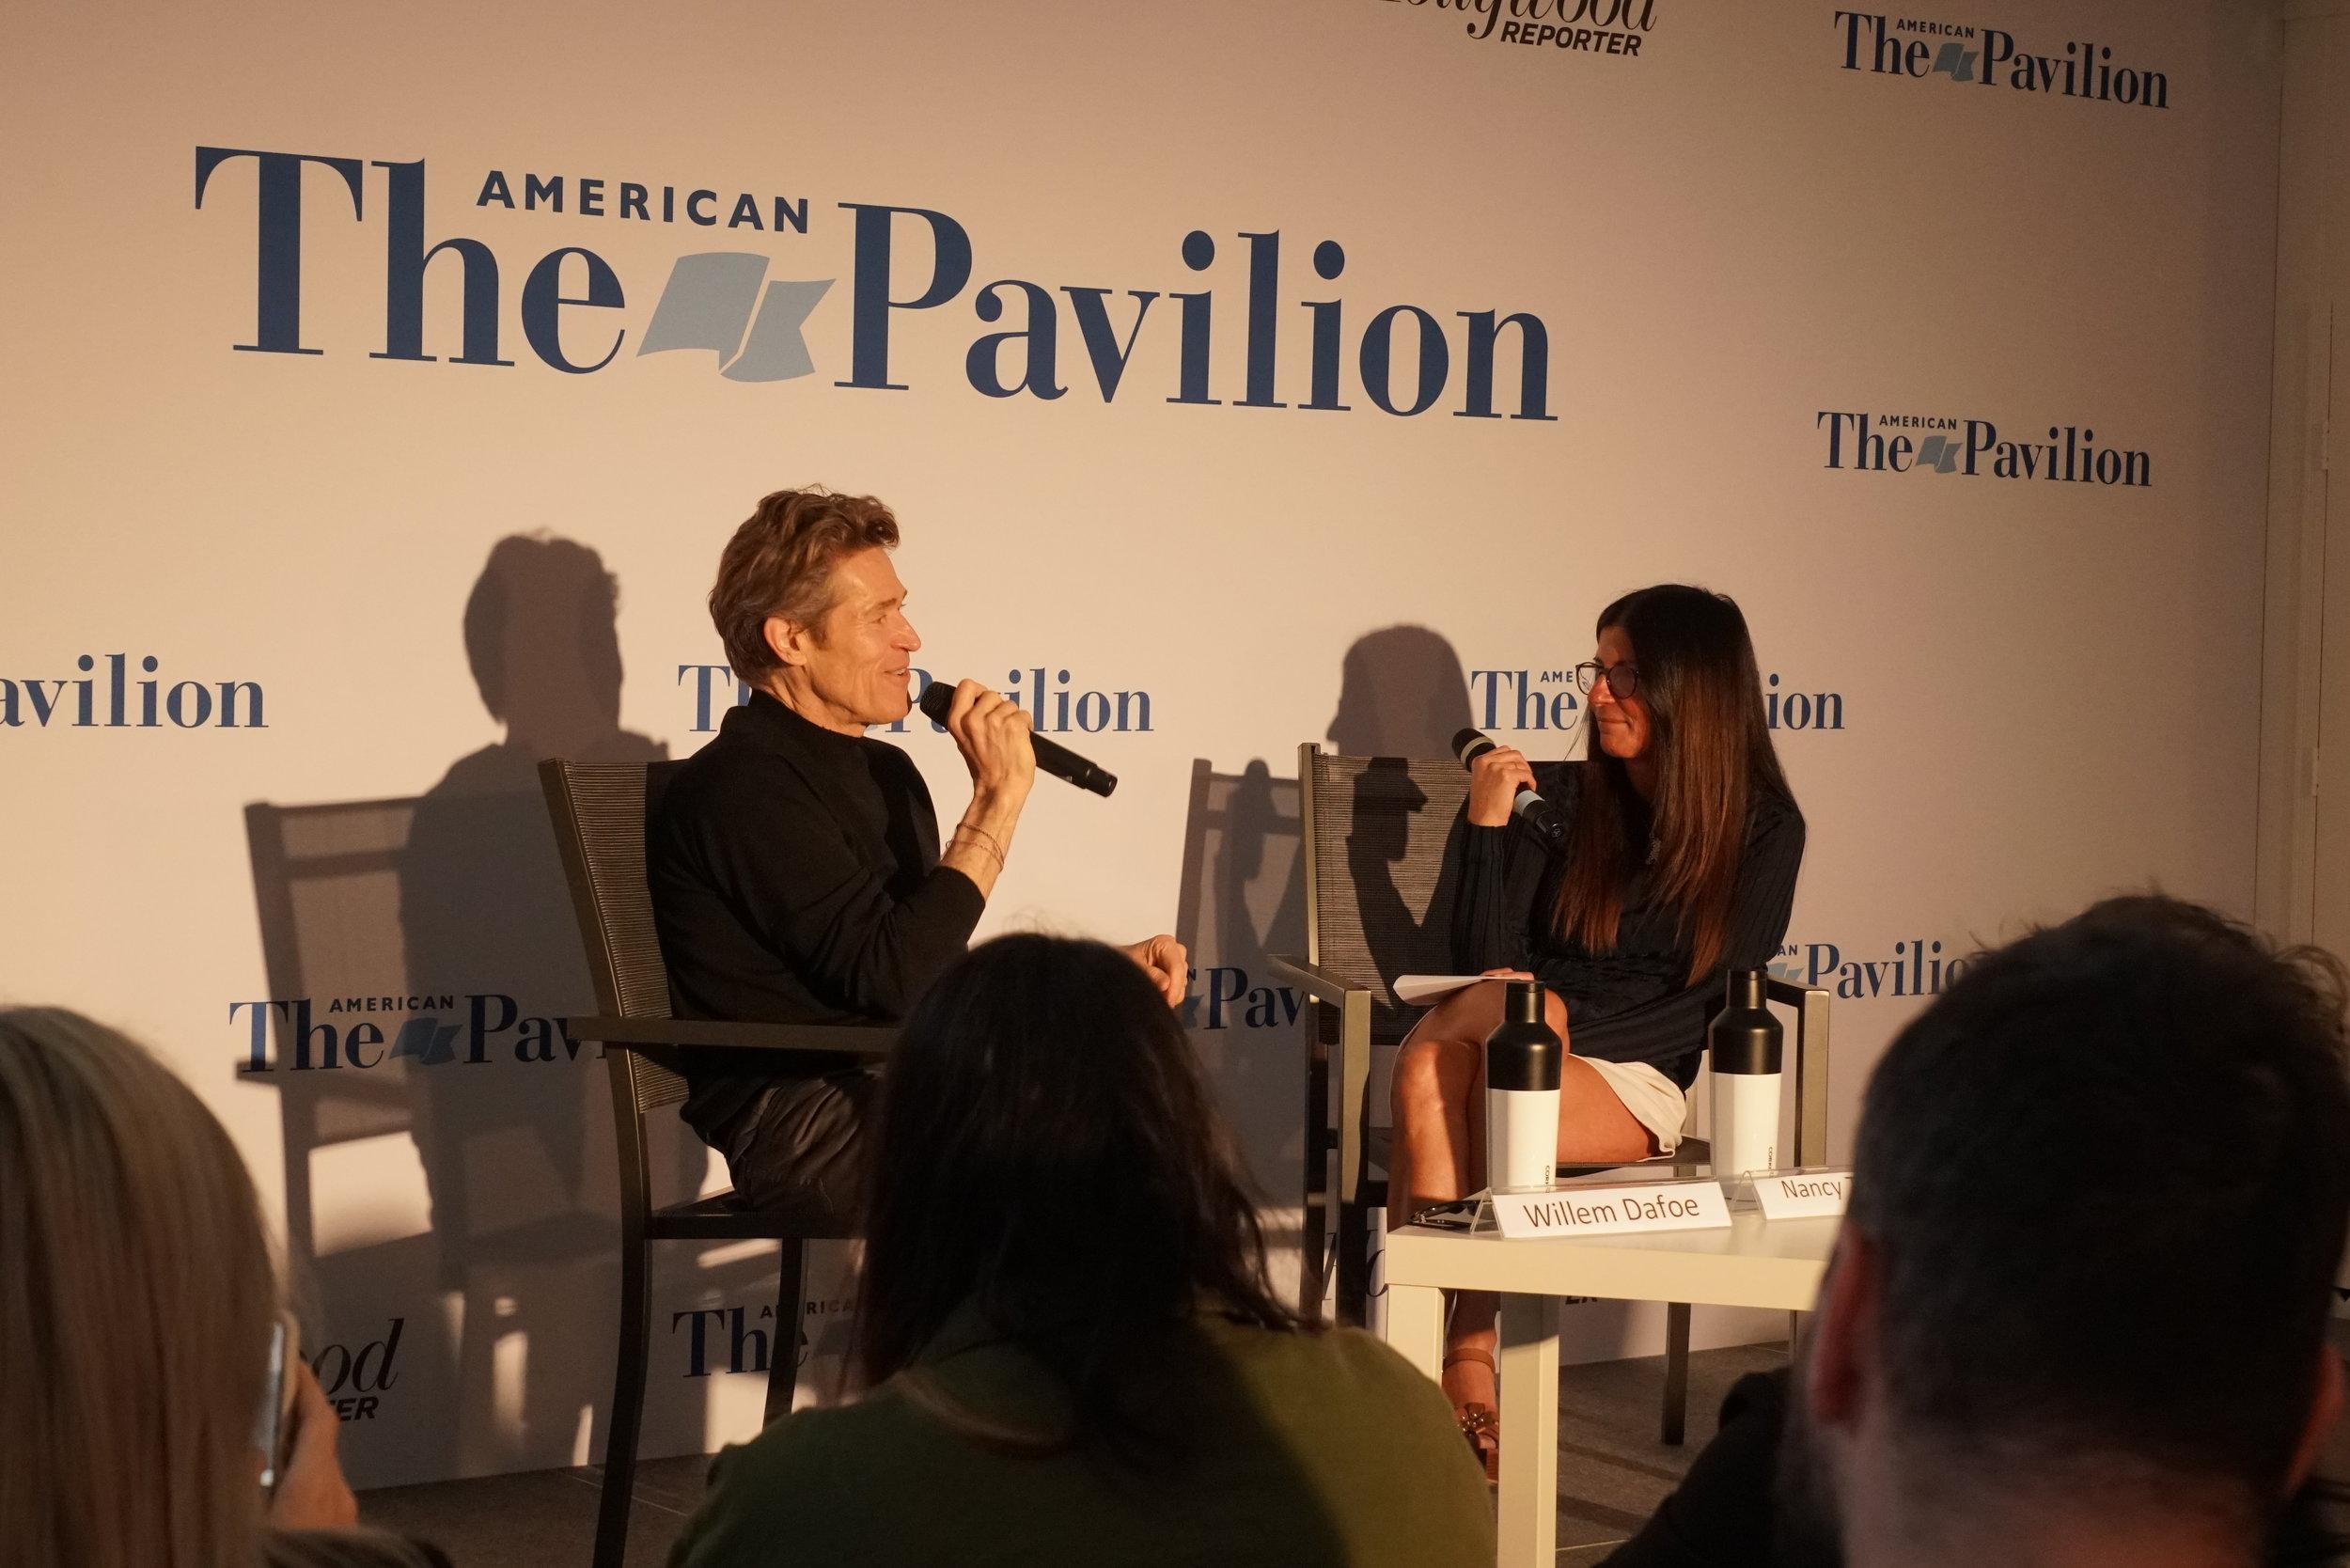 Willem Dafoe in Conversation with Natalie Tartaglione at the American Film Pavilion - © I AM FILM 2019